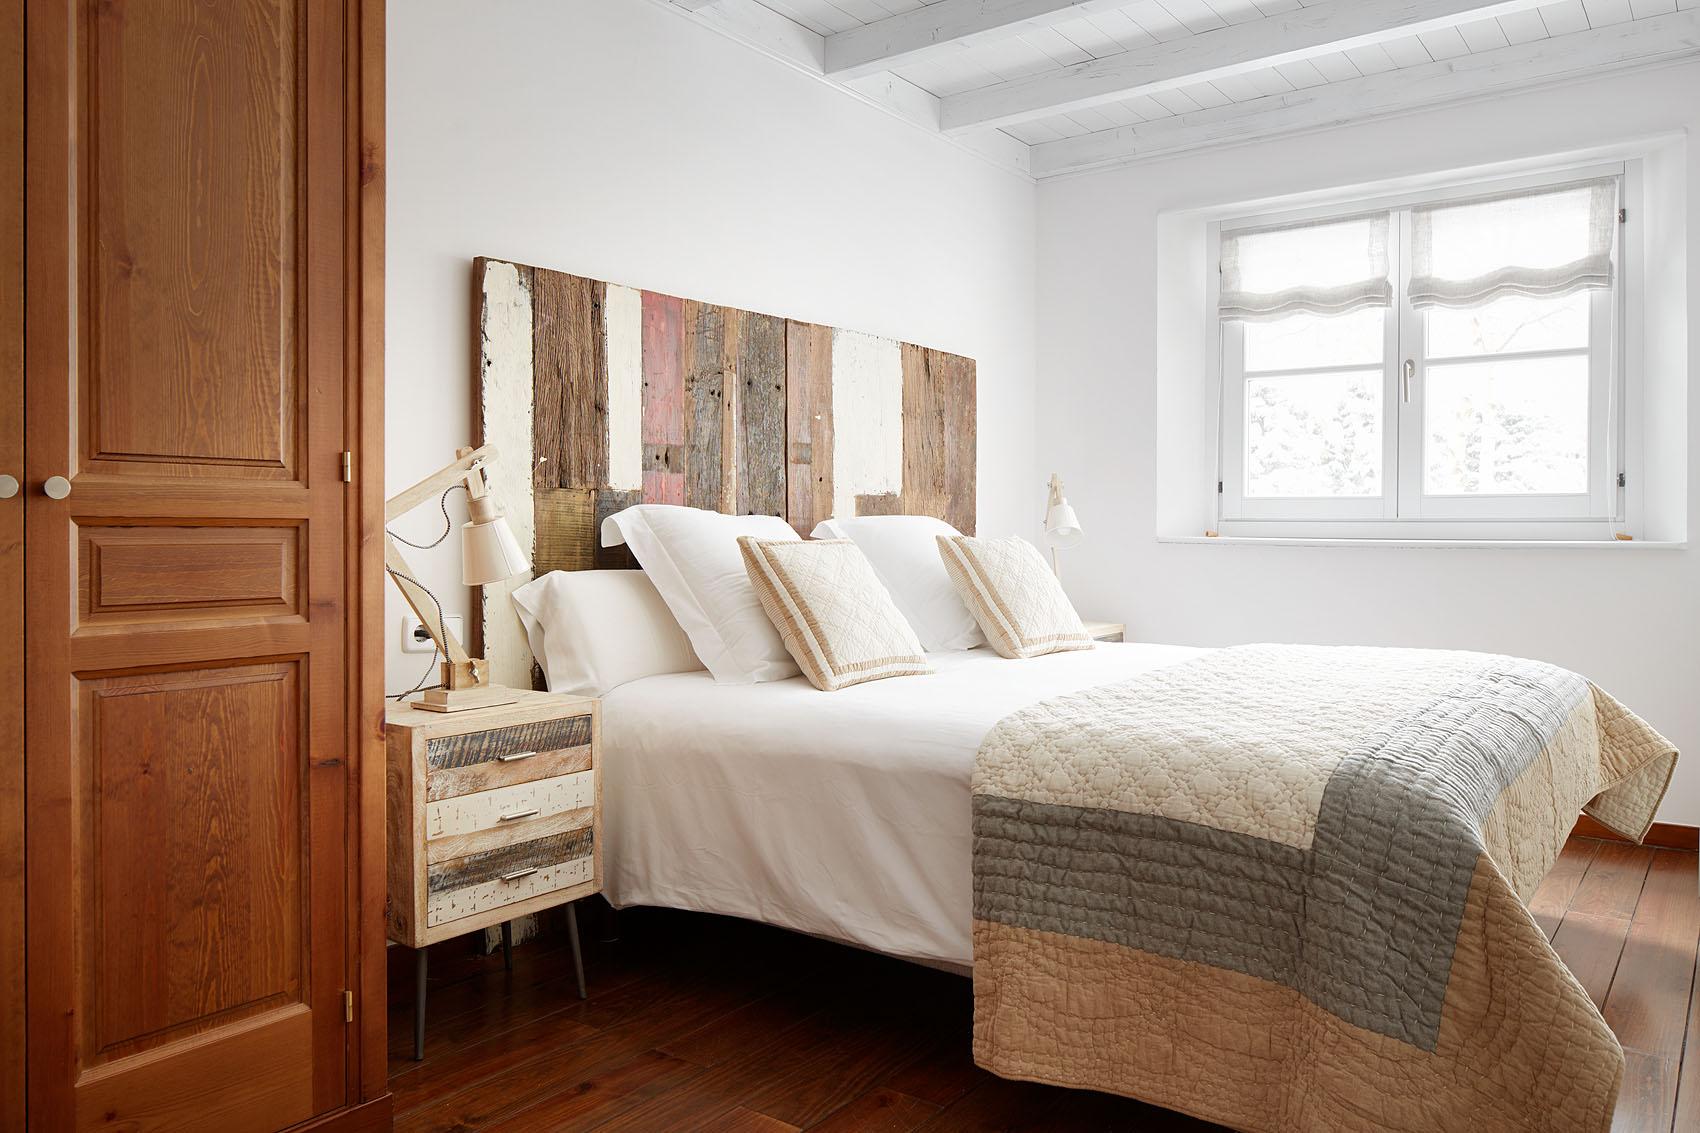 Apartamento Val De Ruda Luxe 59 - Iñaki Caperochipi - Fotografía